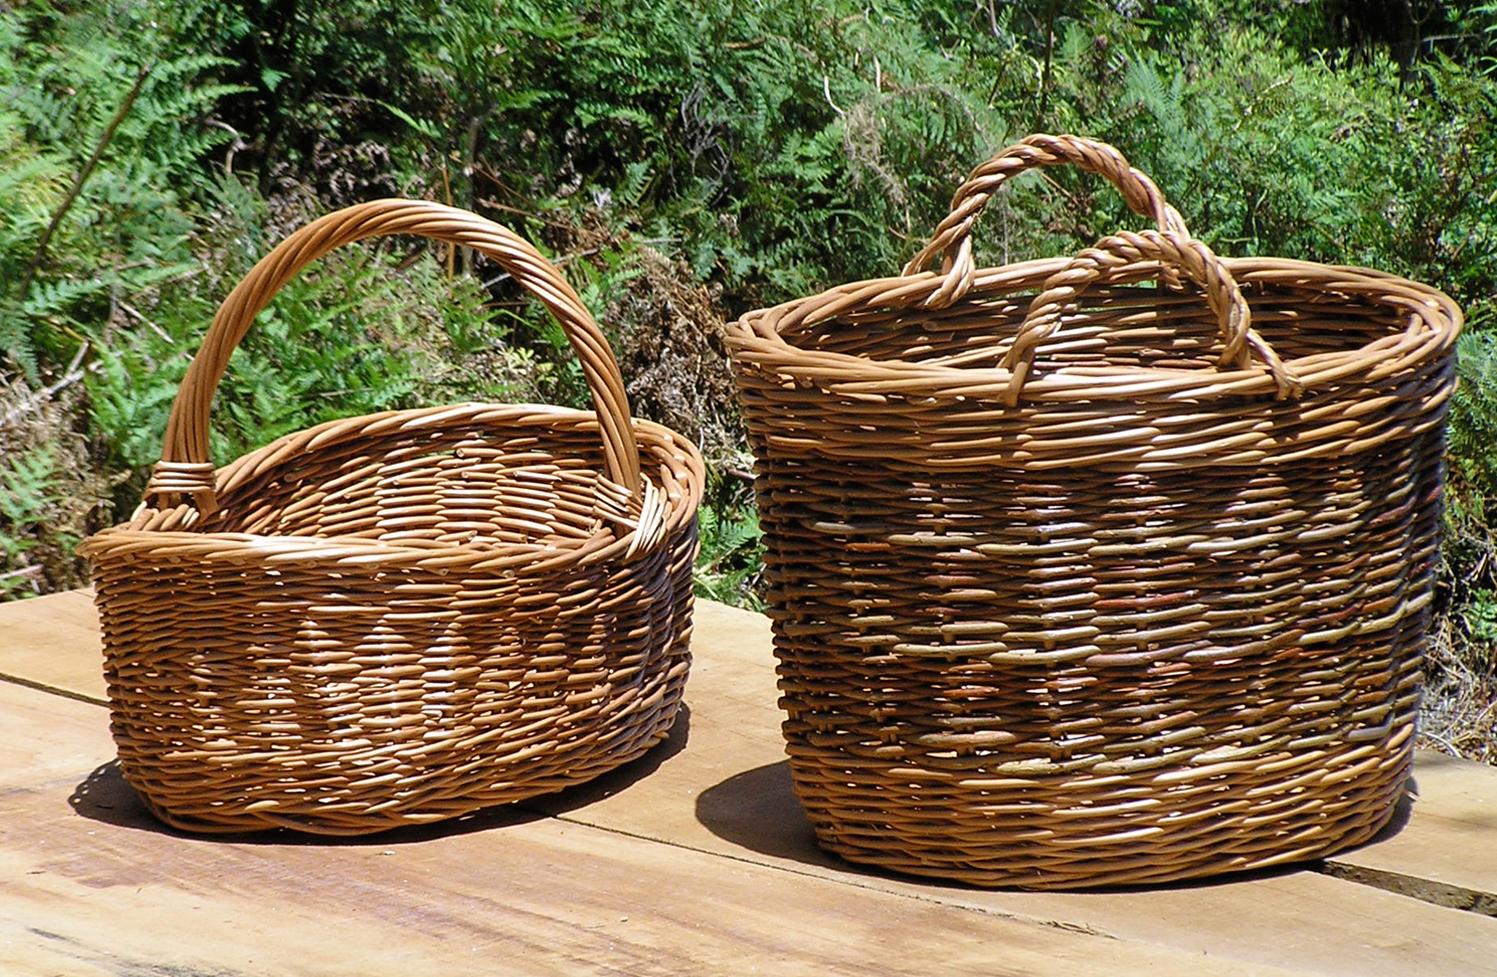 Custom sized baskets